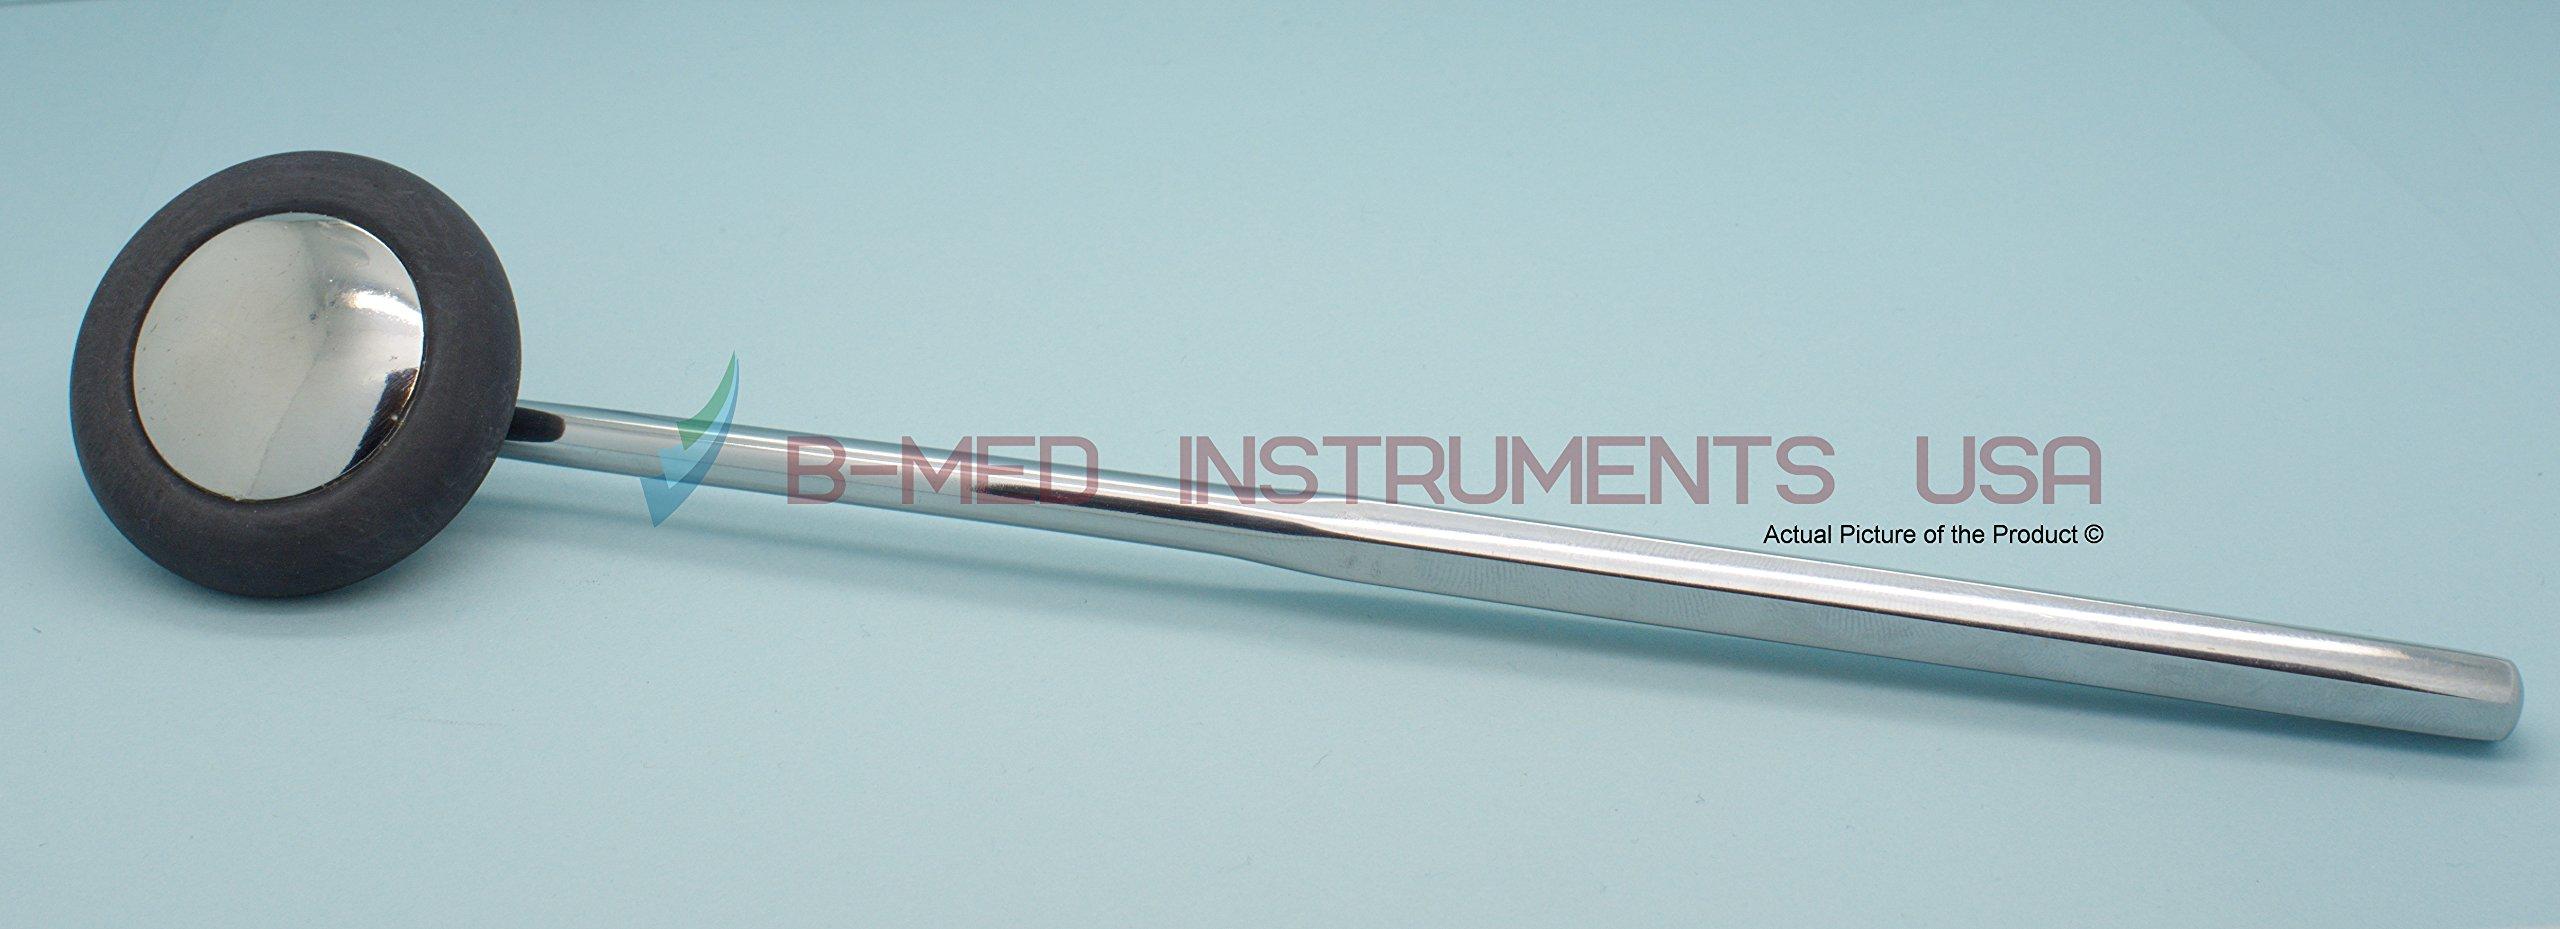 Babinski Rabiner Neurological Telescoping Reflex Hammer Diagnostic Medical Instruments